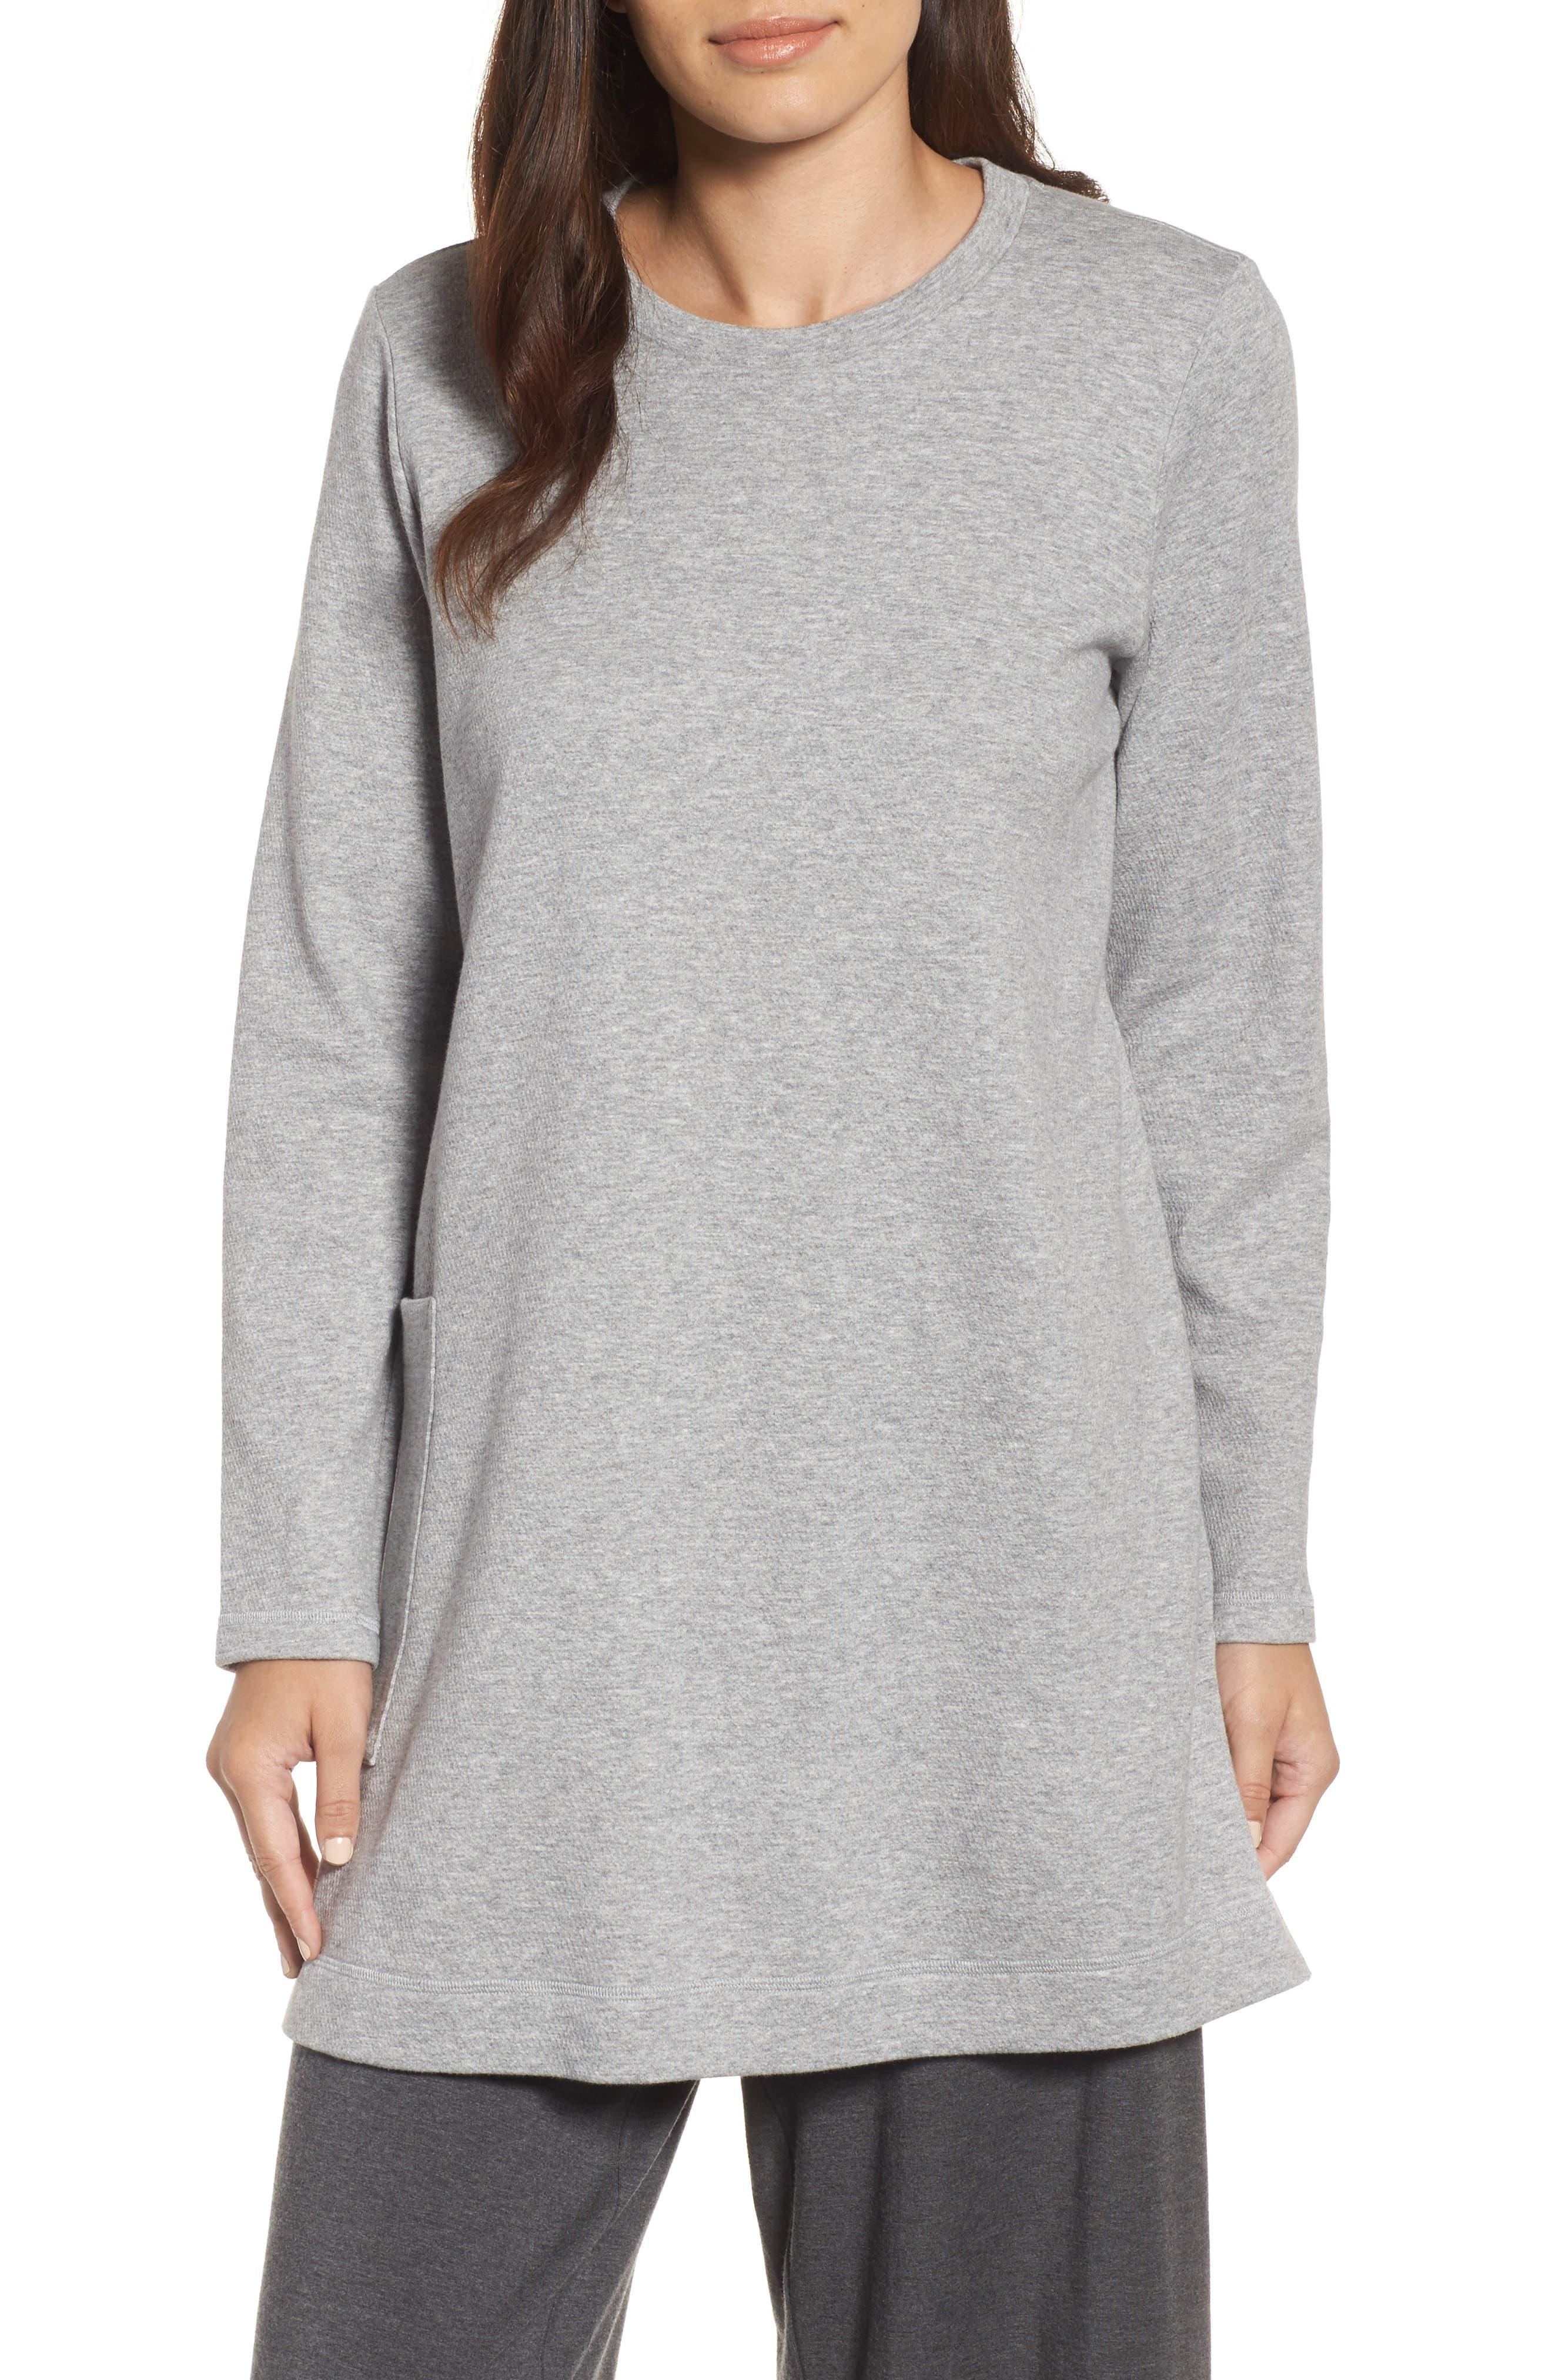 Double Knit Organic Cotton Tunic,                             Main thumbnail 1, color,                             022